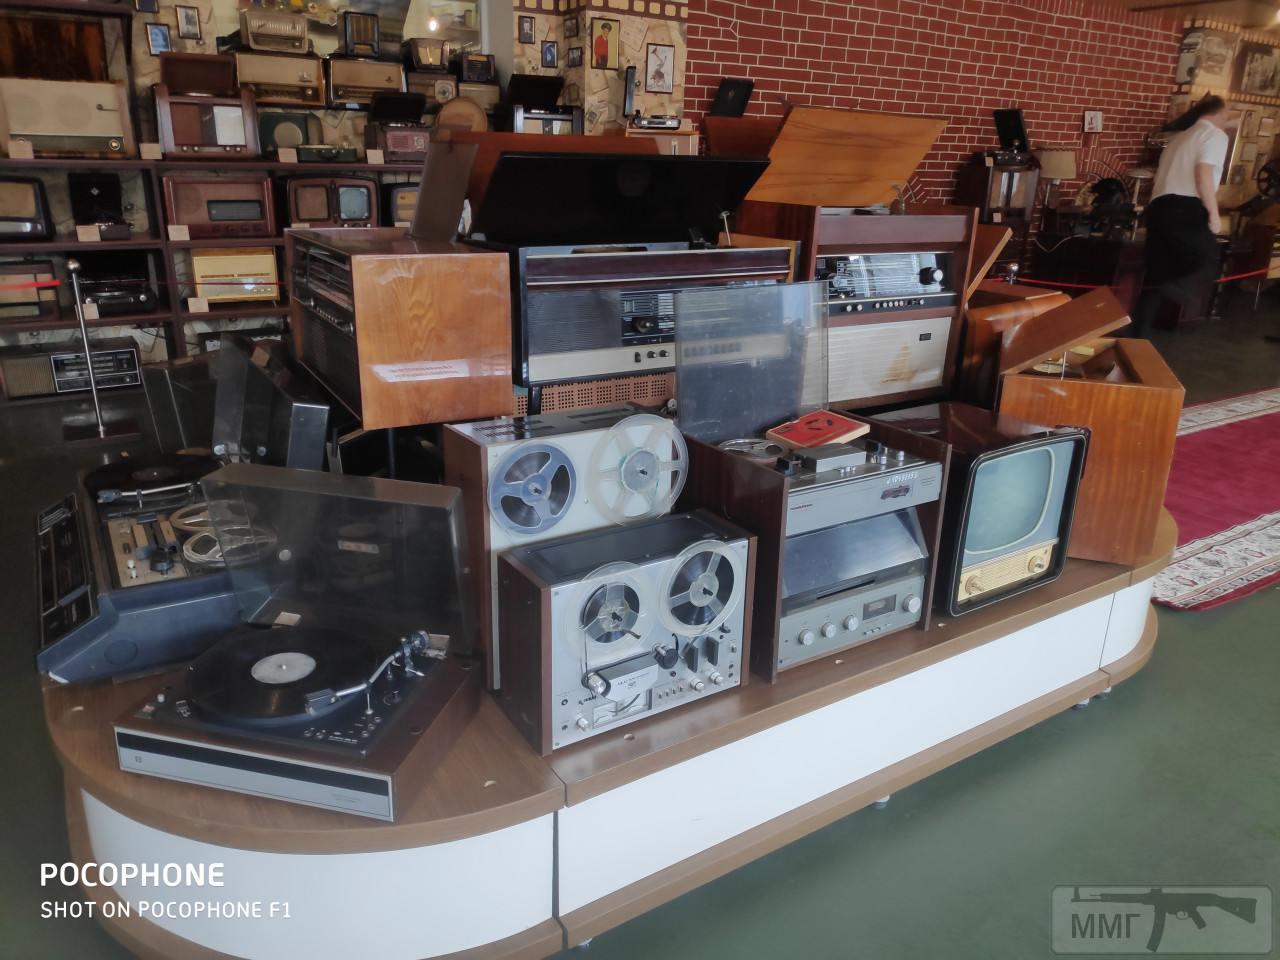 71122 - Музей техники Фаэтон в г. Запорожье